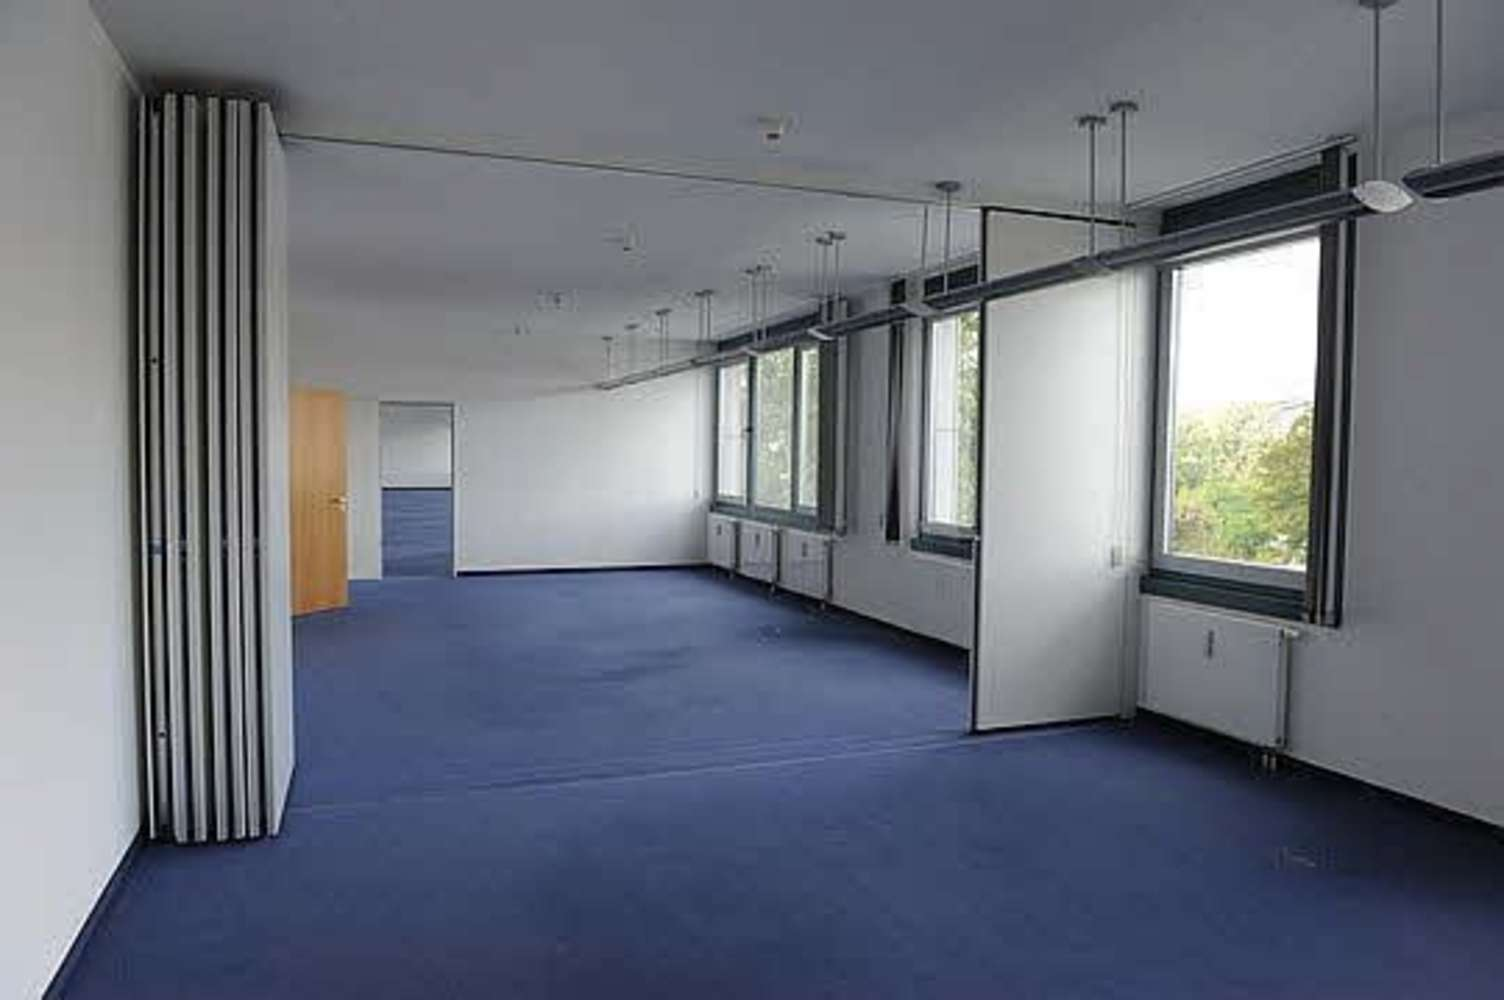 Büros Offenbach am main, 63067 - Büro - Offenbach am Main - F1409 - 9586369